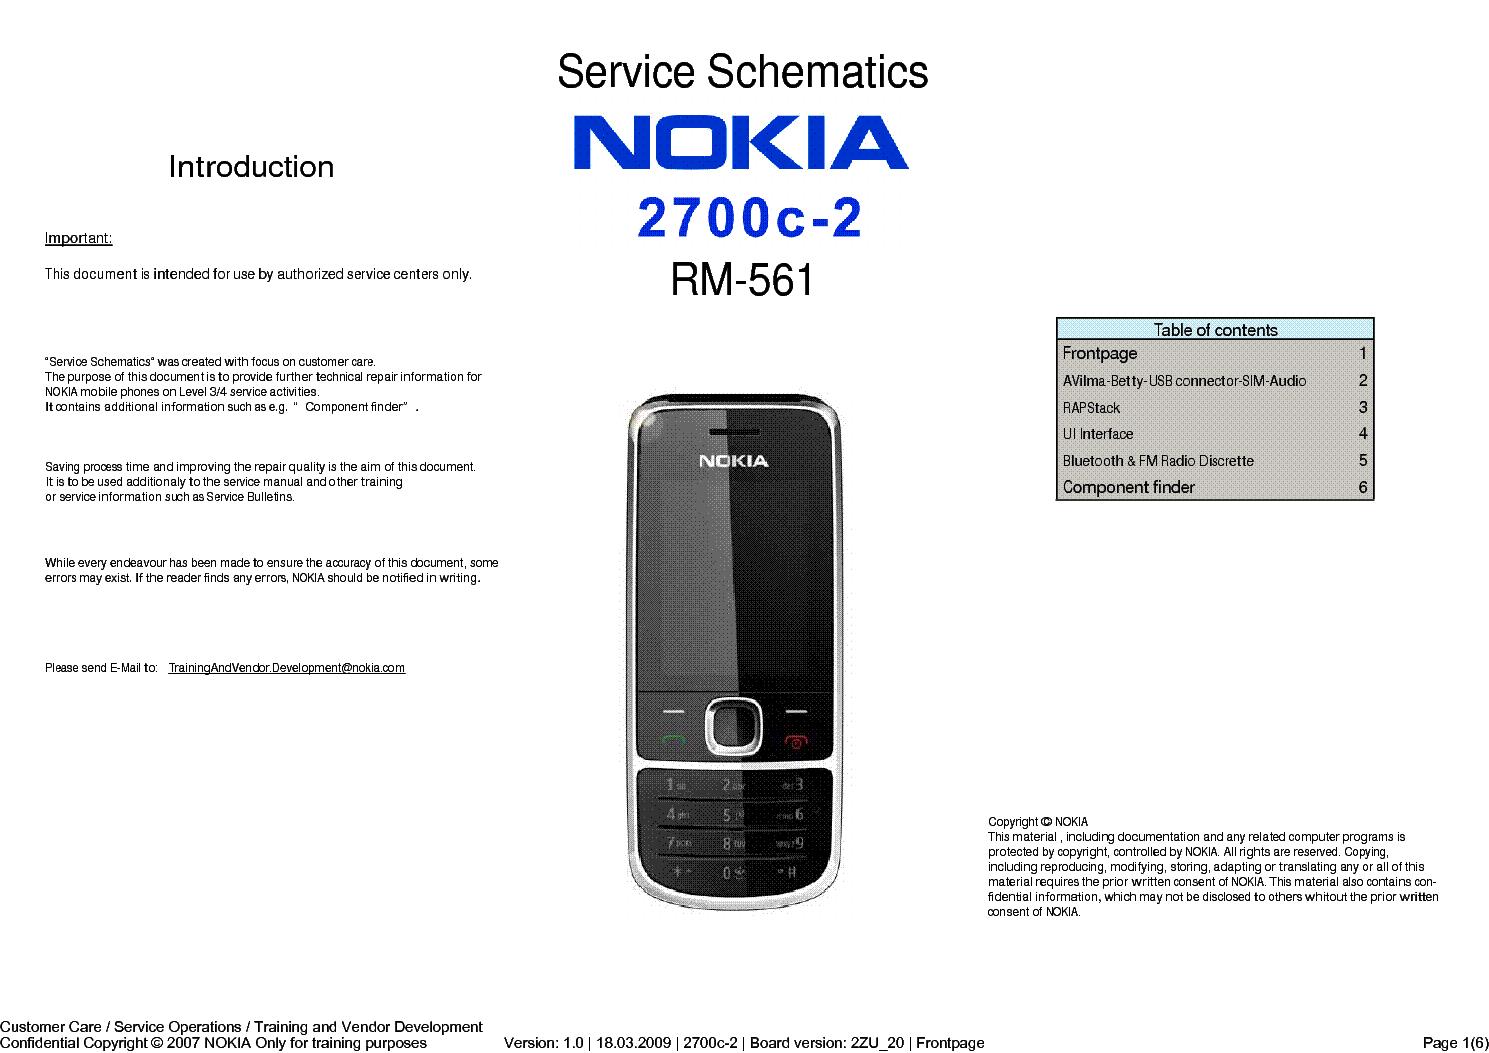 nokia 2700c 2 rm561 sch service manual download schematics eeprom rh elektrotanya com Nokia 1100 Nokia 3310